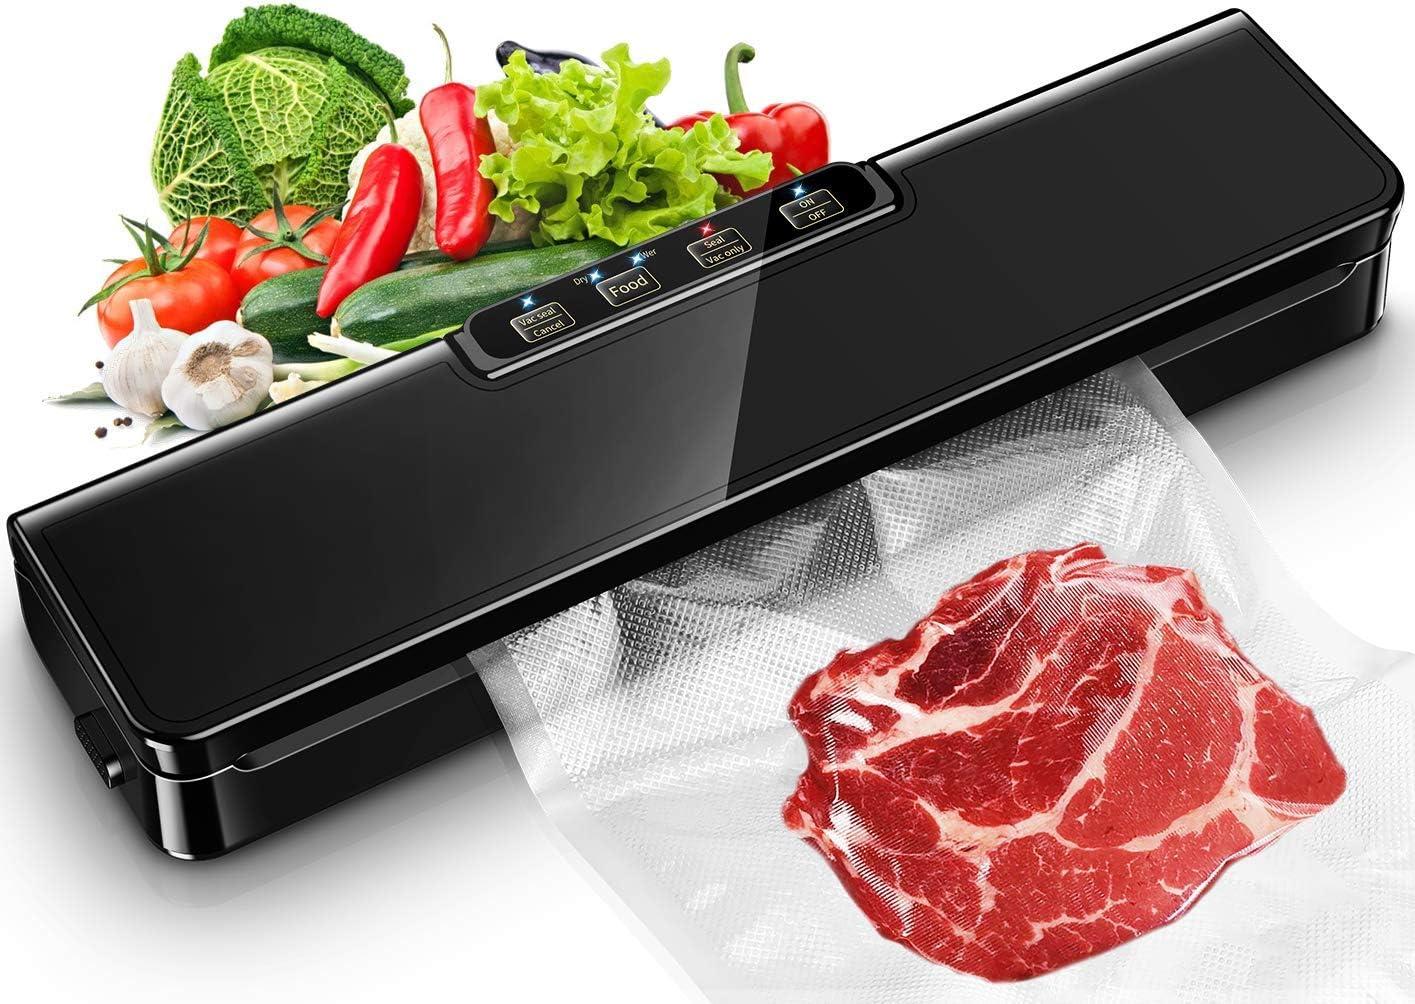 Vacuum Sealer Machine, Automatic Food Sealer For Food savers vacuum sealer| Starter Kit|Dry & Moist Food Modes| Compact | Easy to Clean | Led Indicator Lights(15 vacuum sealing bags)